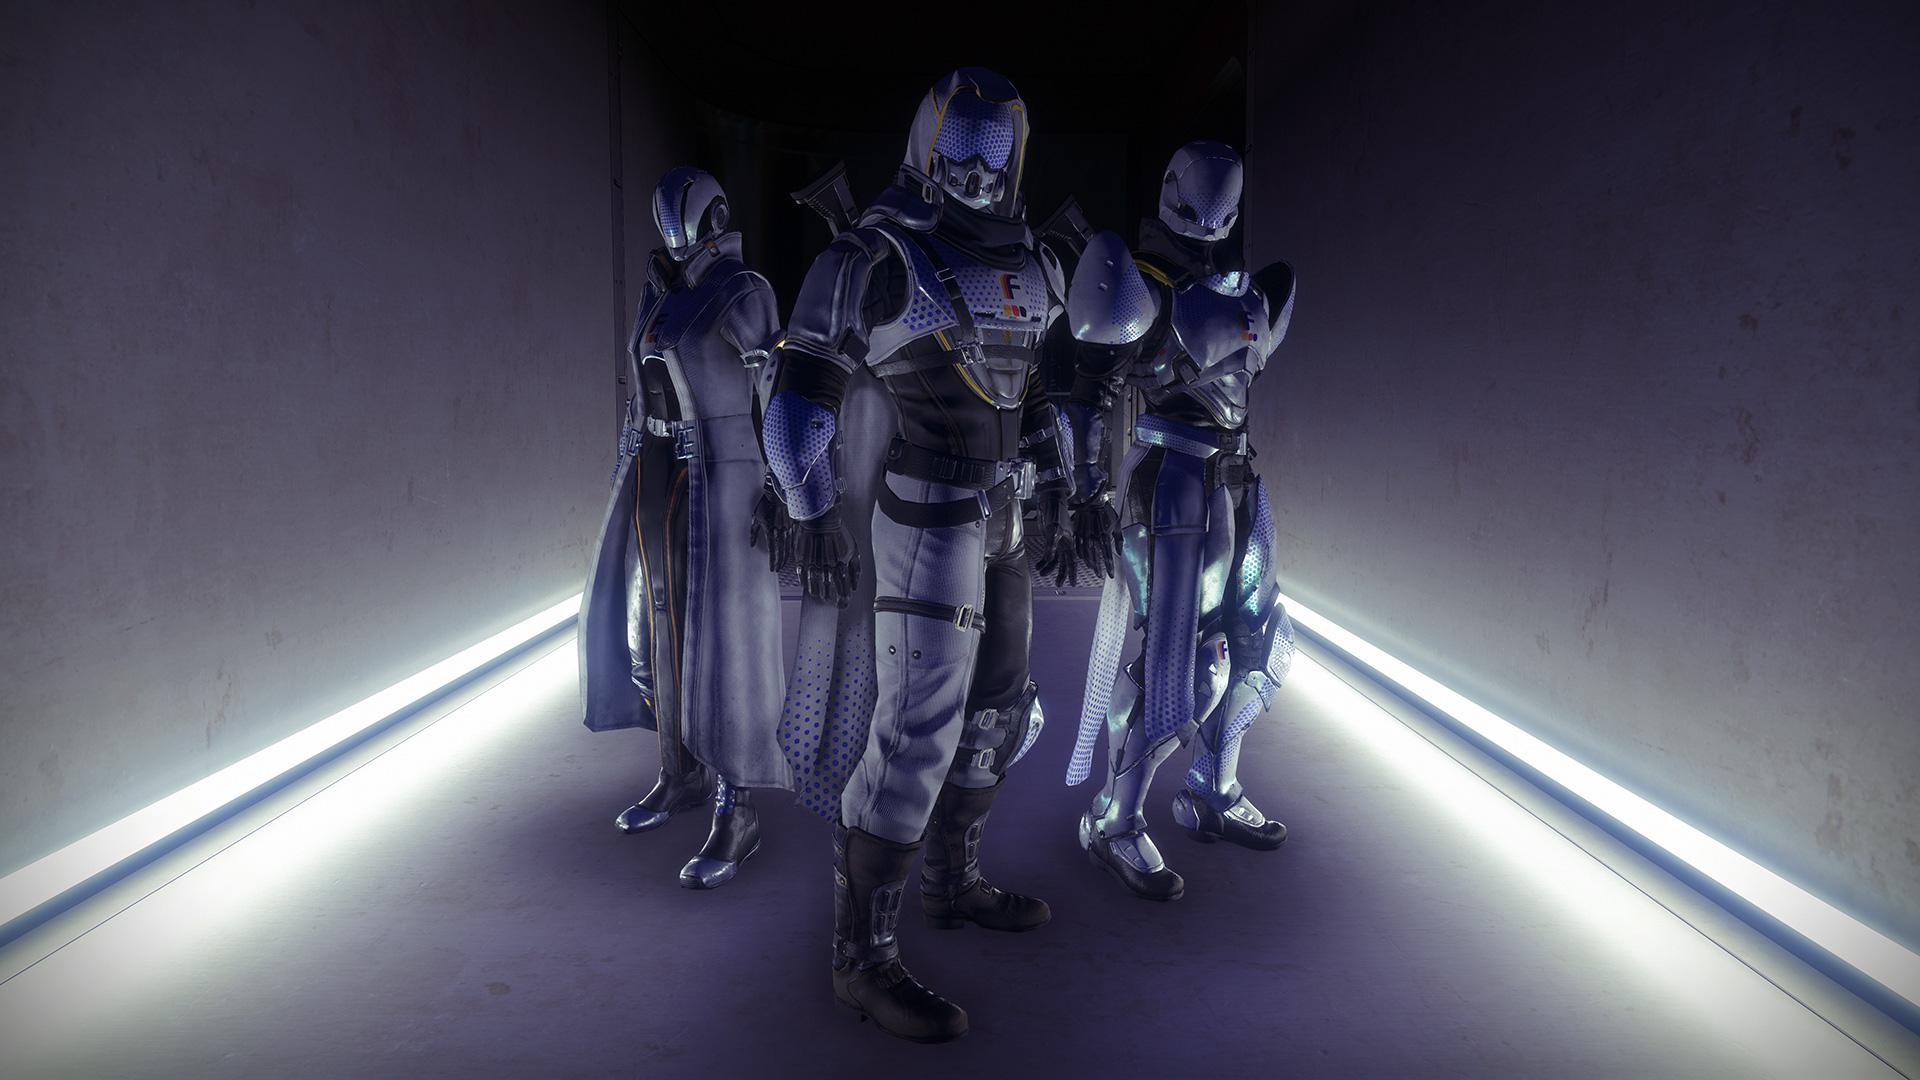 destiny_2_faction_rally_season_2_armour_ornaments_future_war_cult